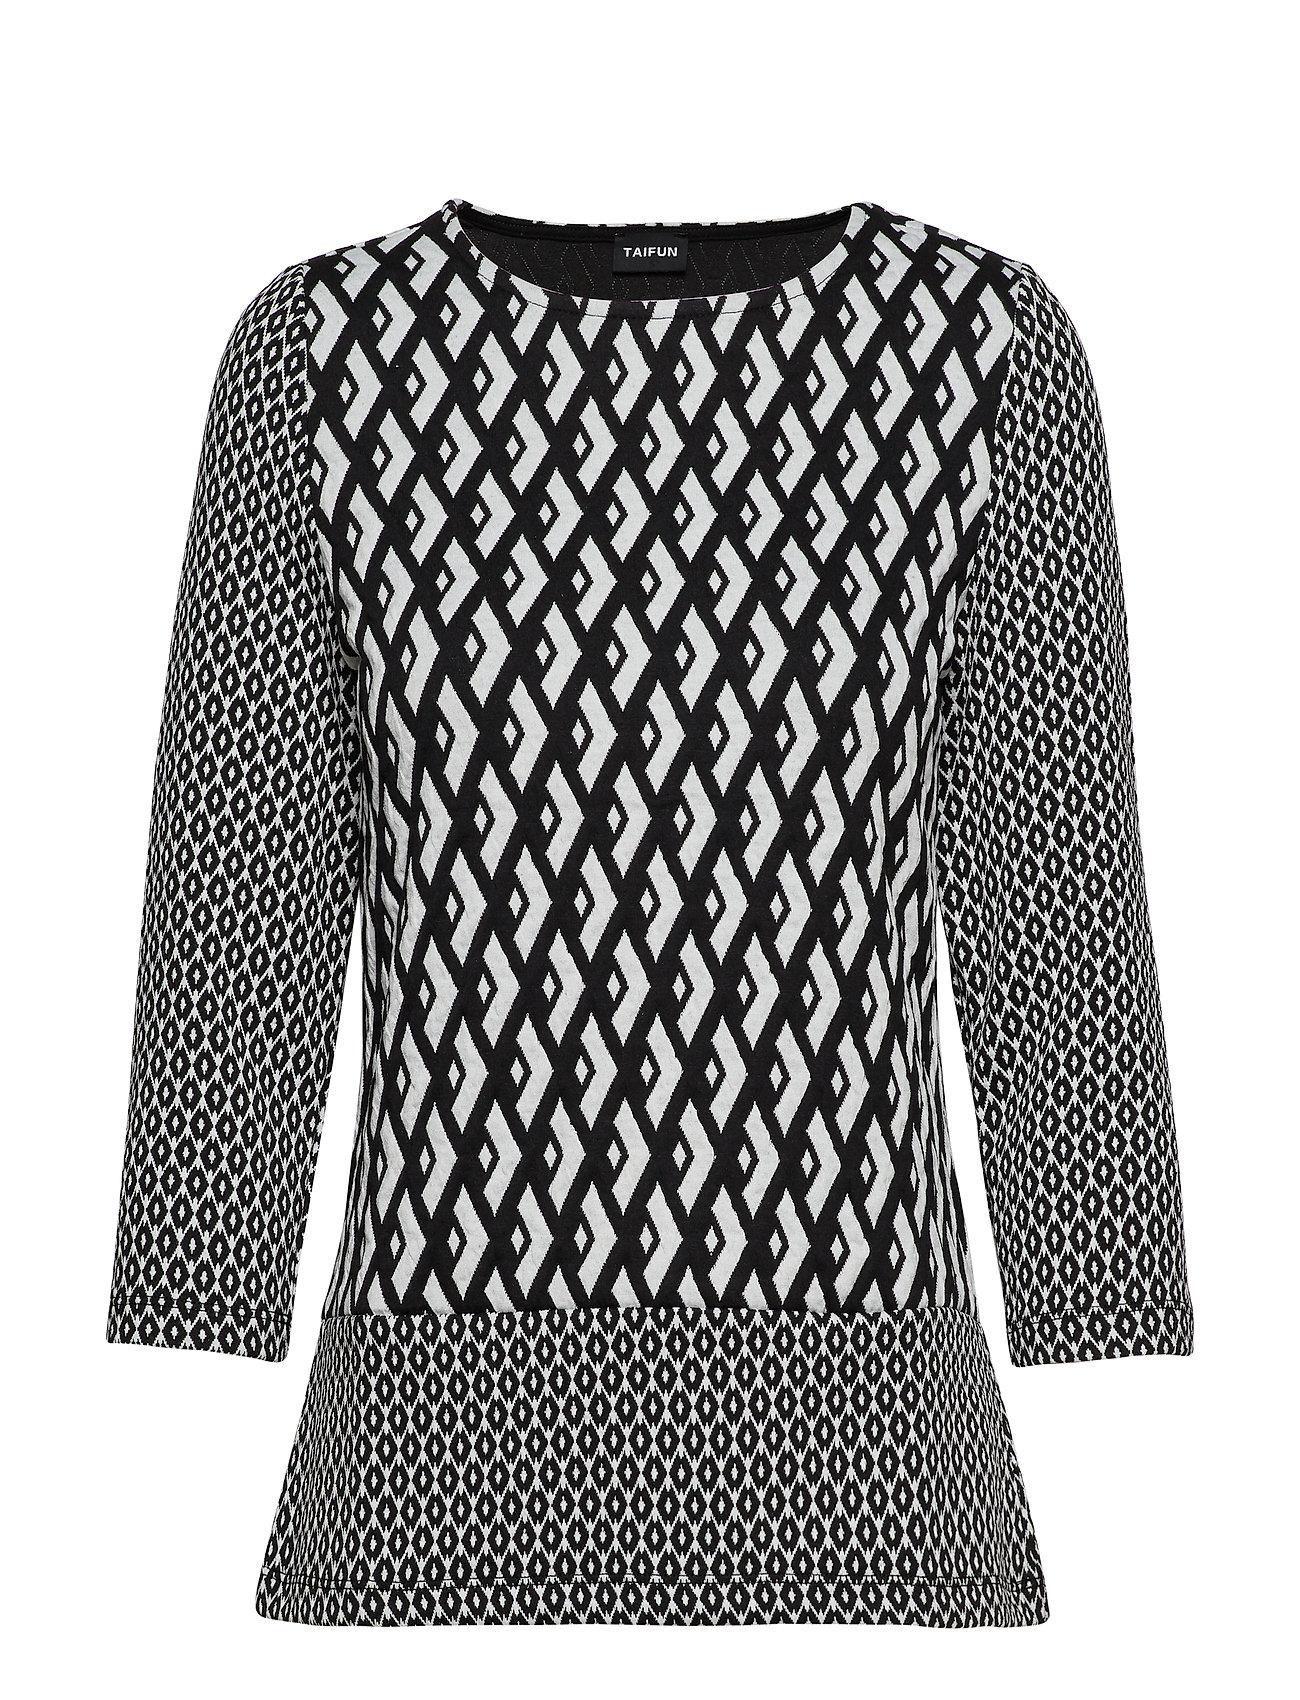 3 4 Rblack T PatternedTaifun shirt sleeve 7fb6vIYgy